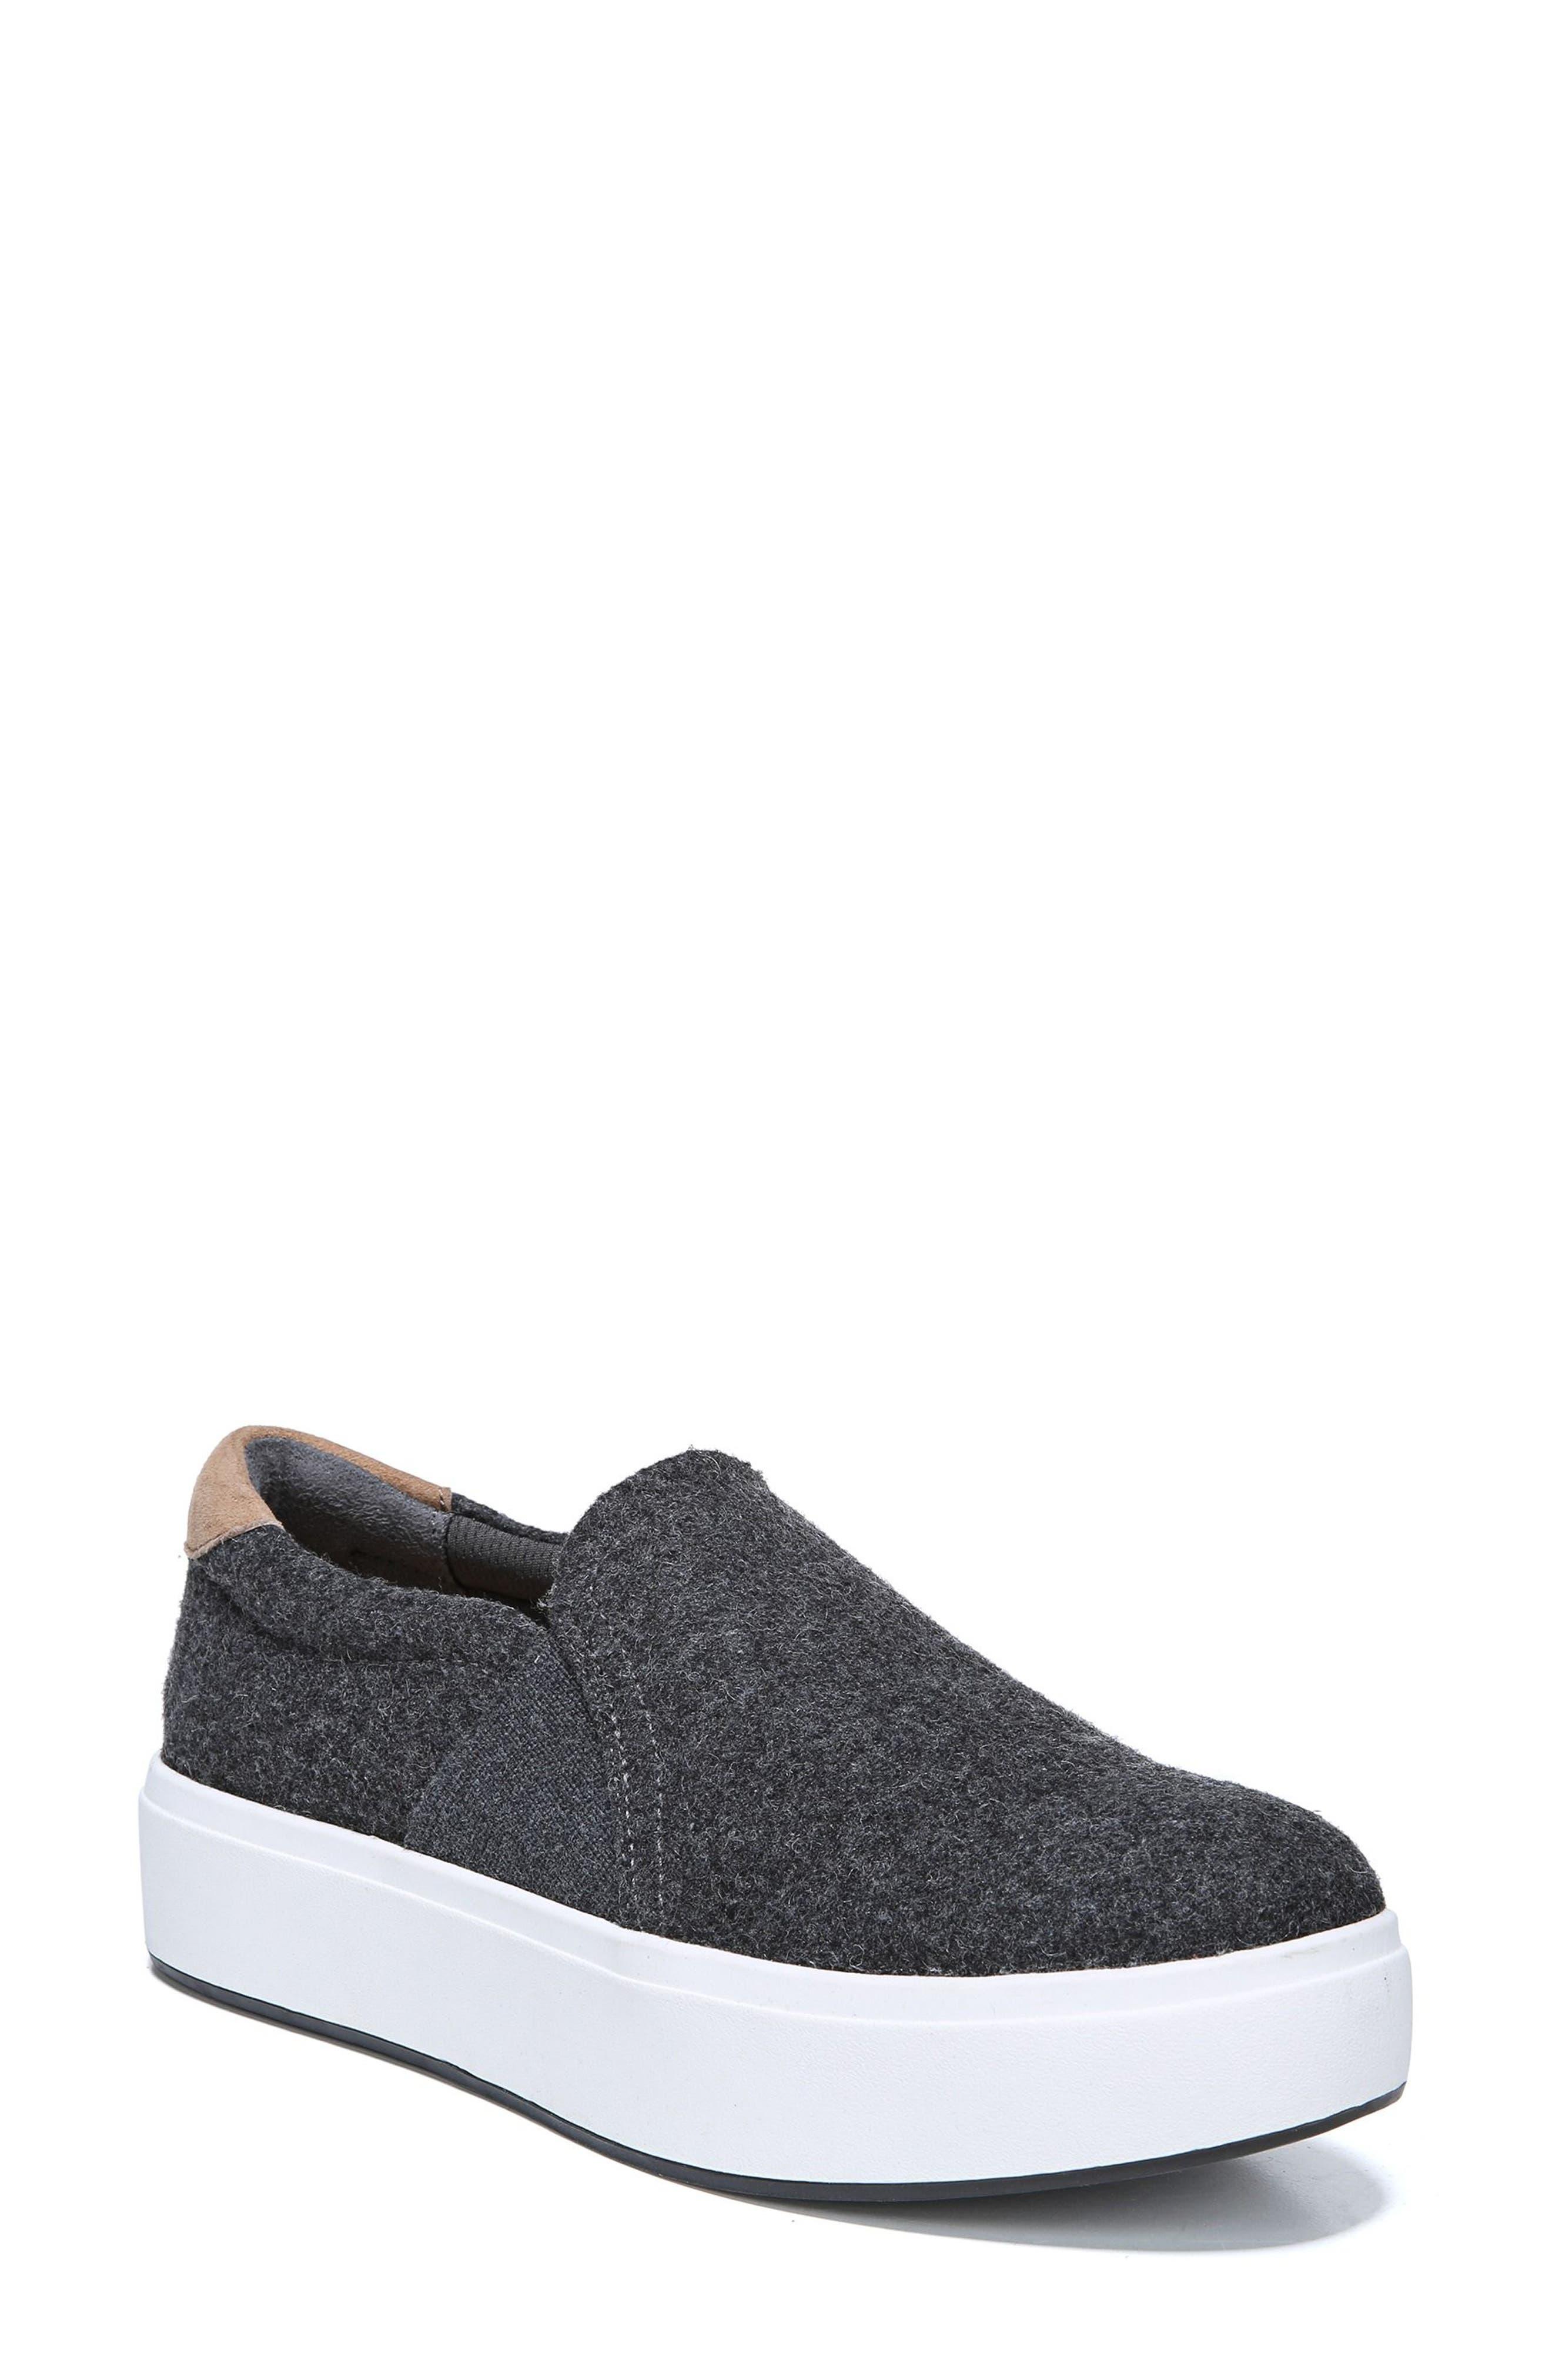 Abbot Slip-On Sneaker,                             Main thumbnail 1, color,                             GREY FABRIC